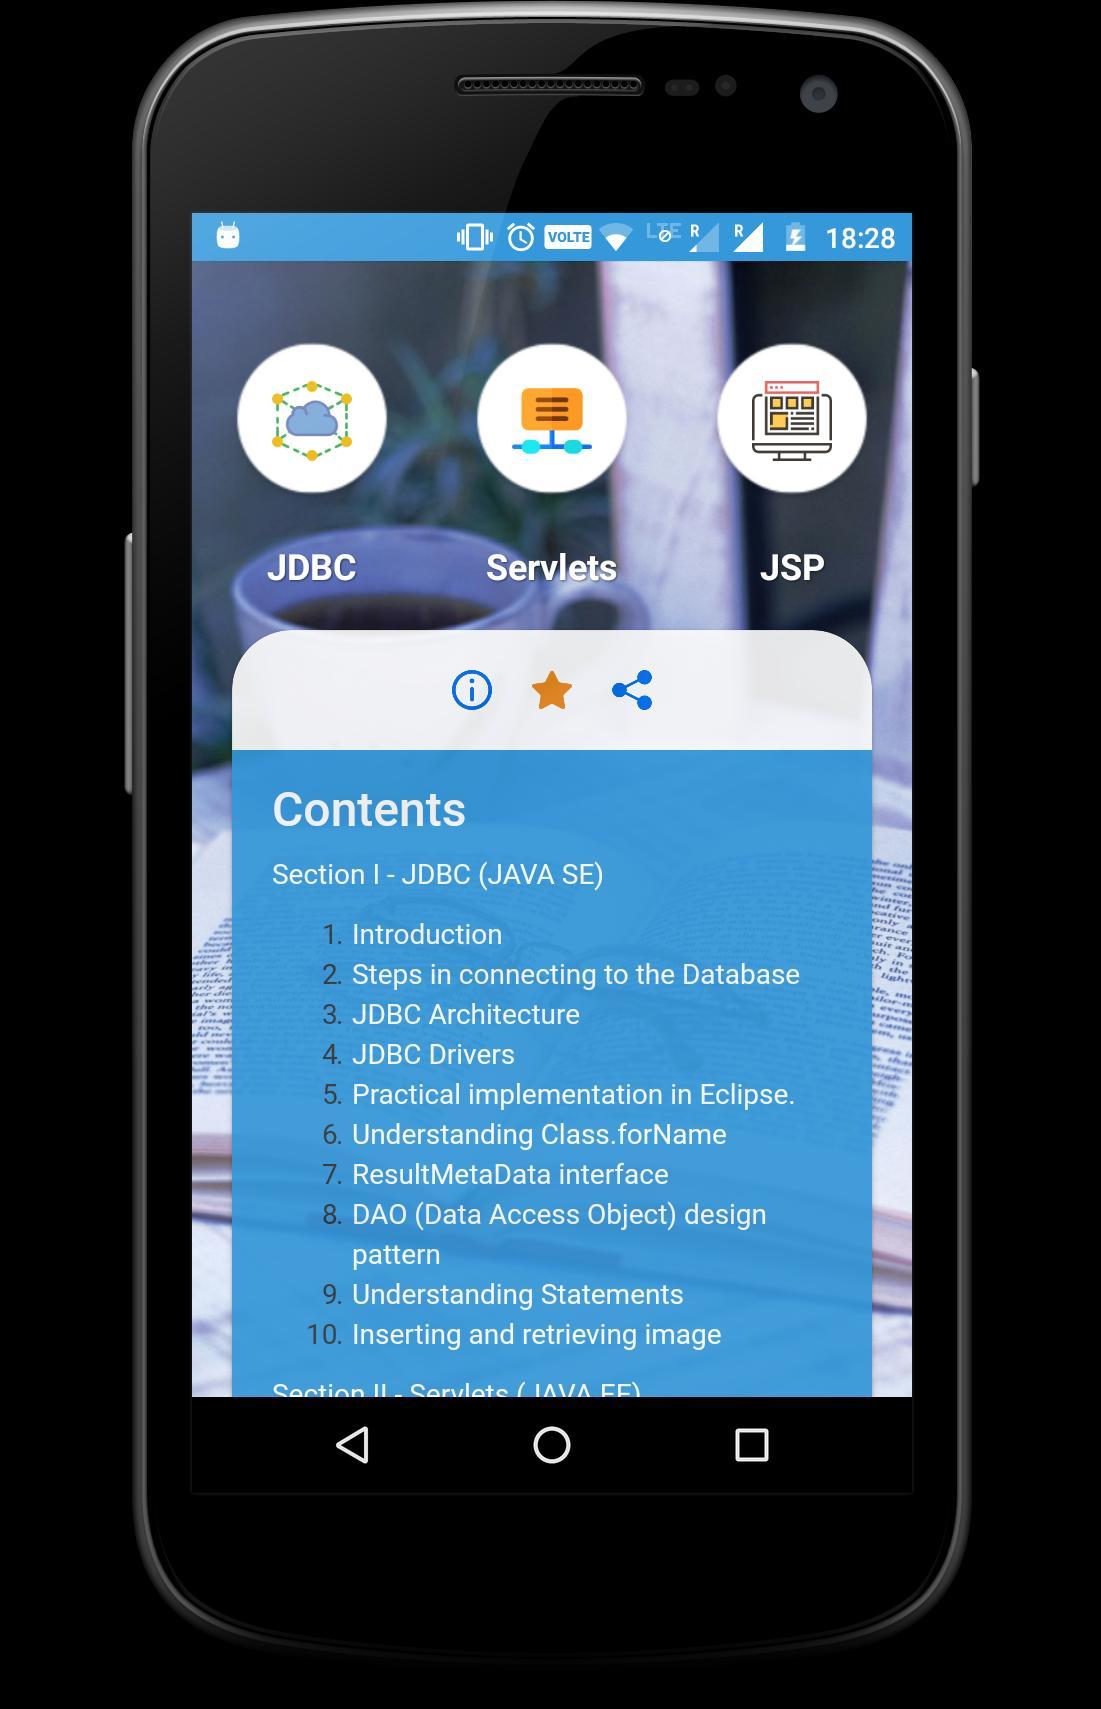 Learn Servlet, JDBC, JSP - JAVA EE Know-how for Android